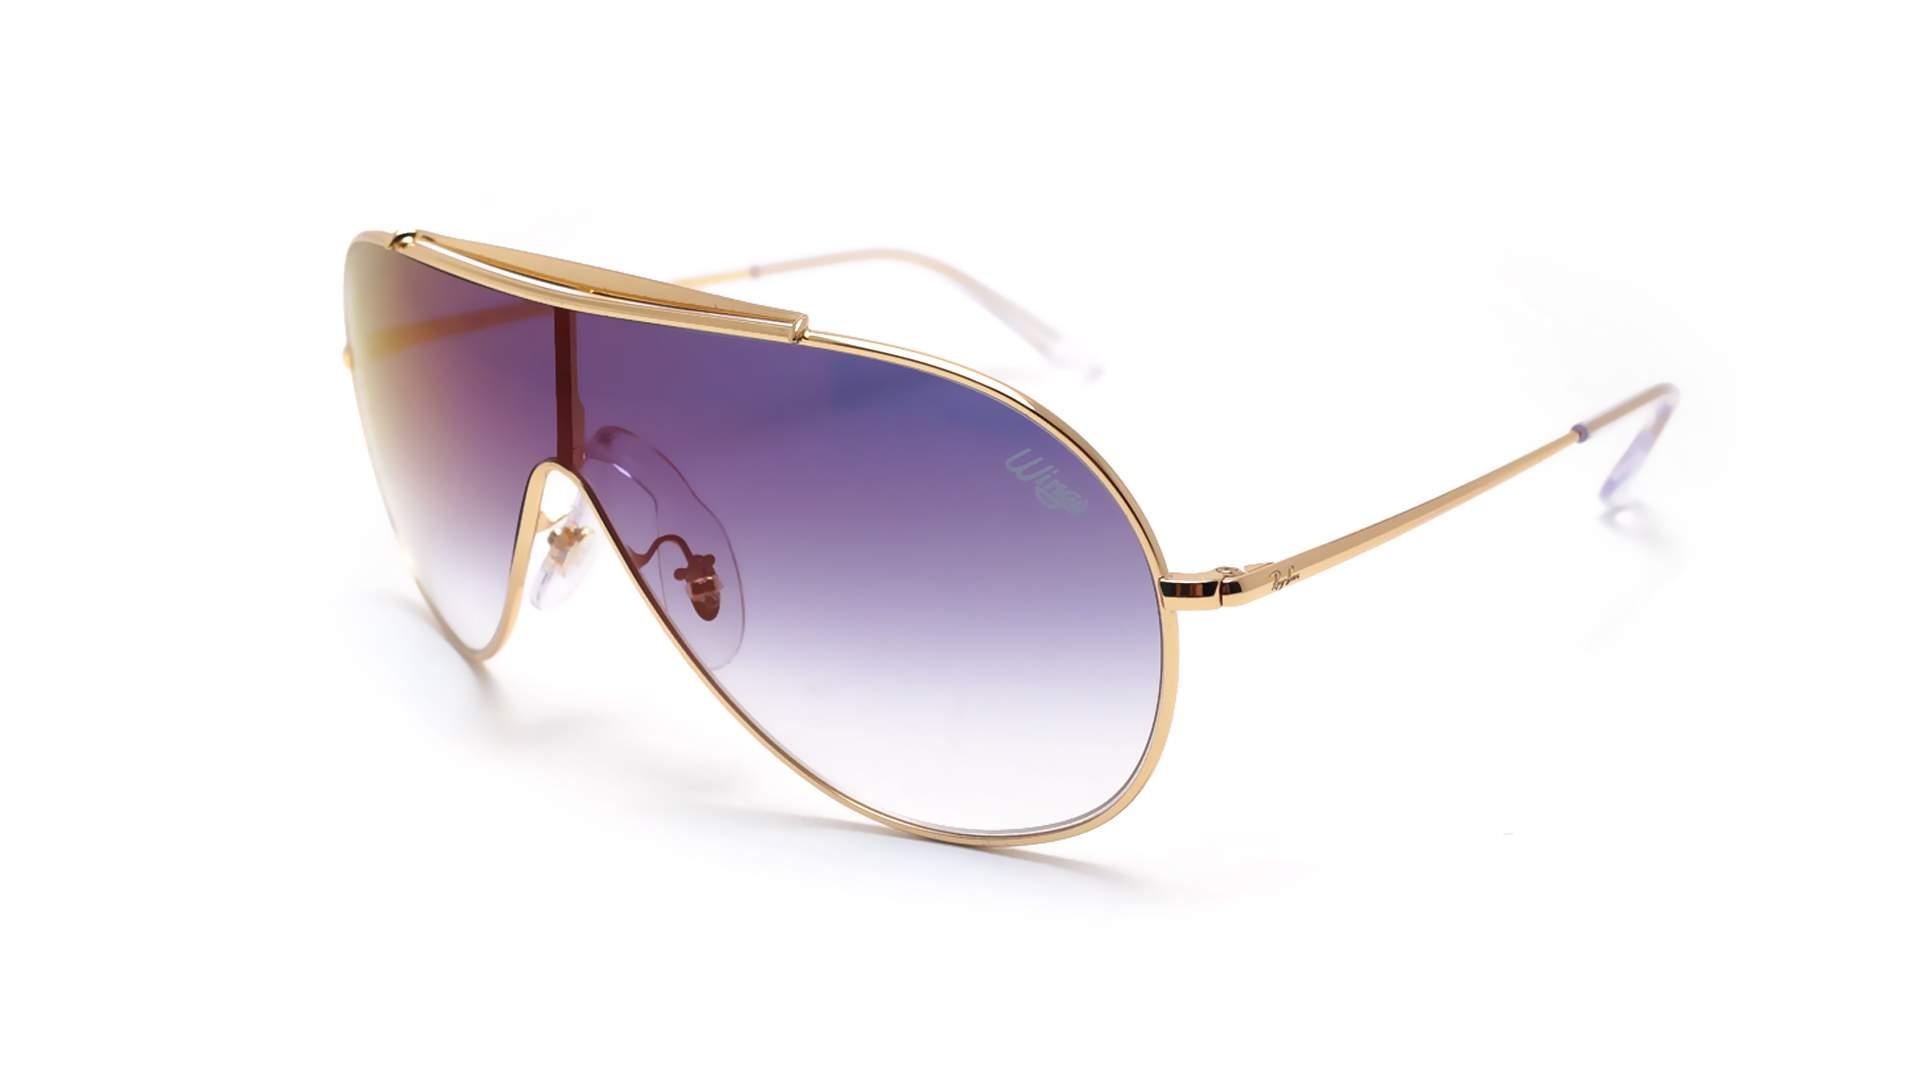 d5a057b490 Sunglasses Ray-Ban Wings Gold RB3597 001 X0 33-18 Medium Gradient Mirror